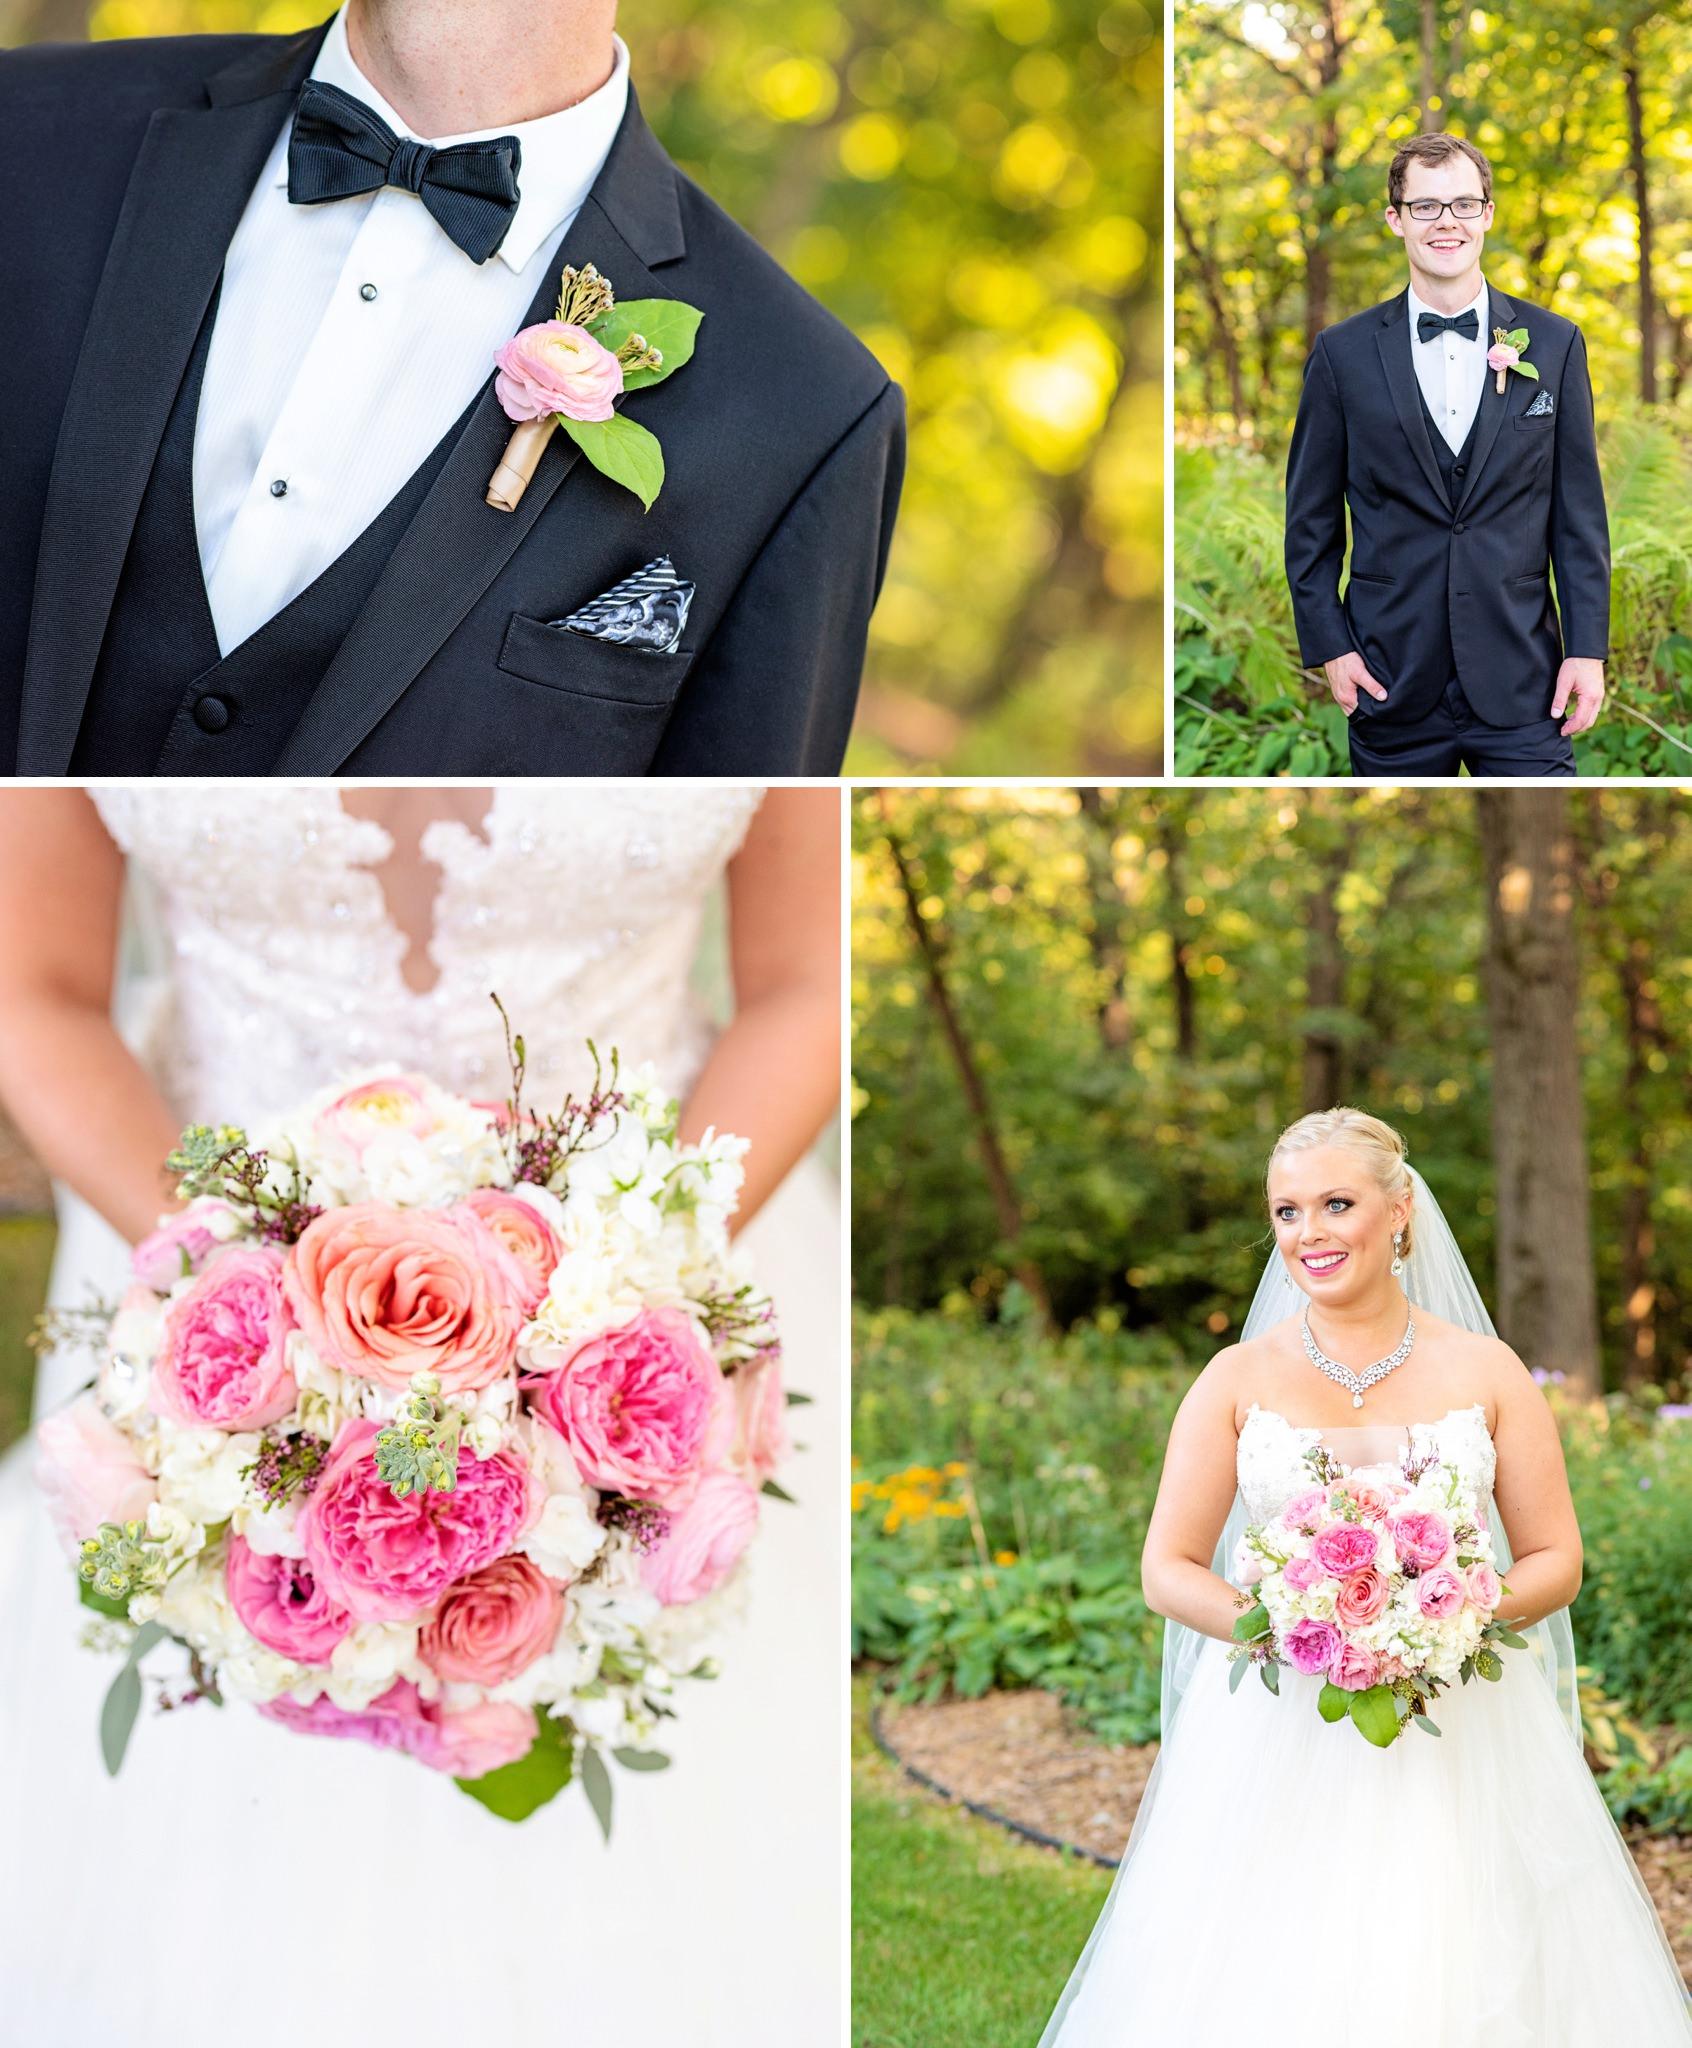 Brittany-Jay-Wedding-091518-Rotella-Photography-26_BLOG.jpg